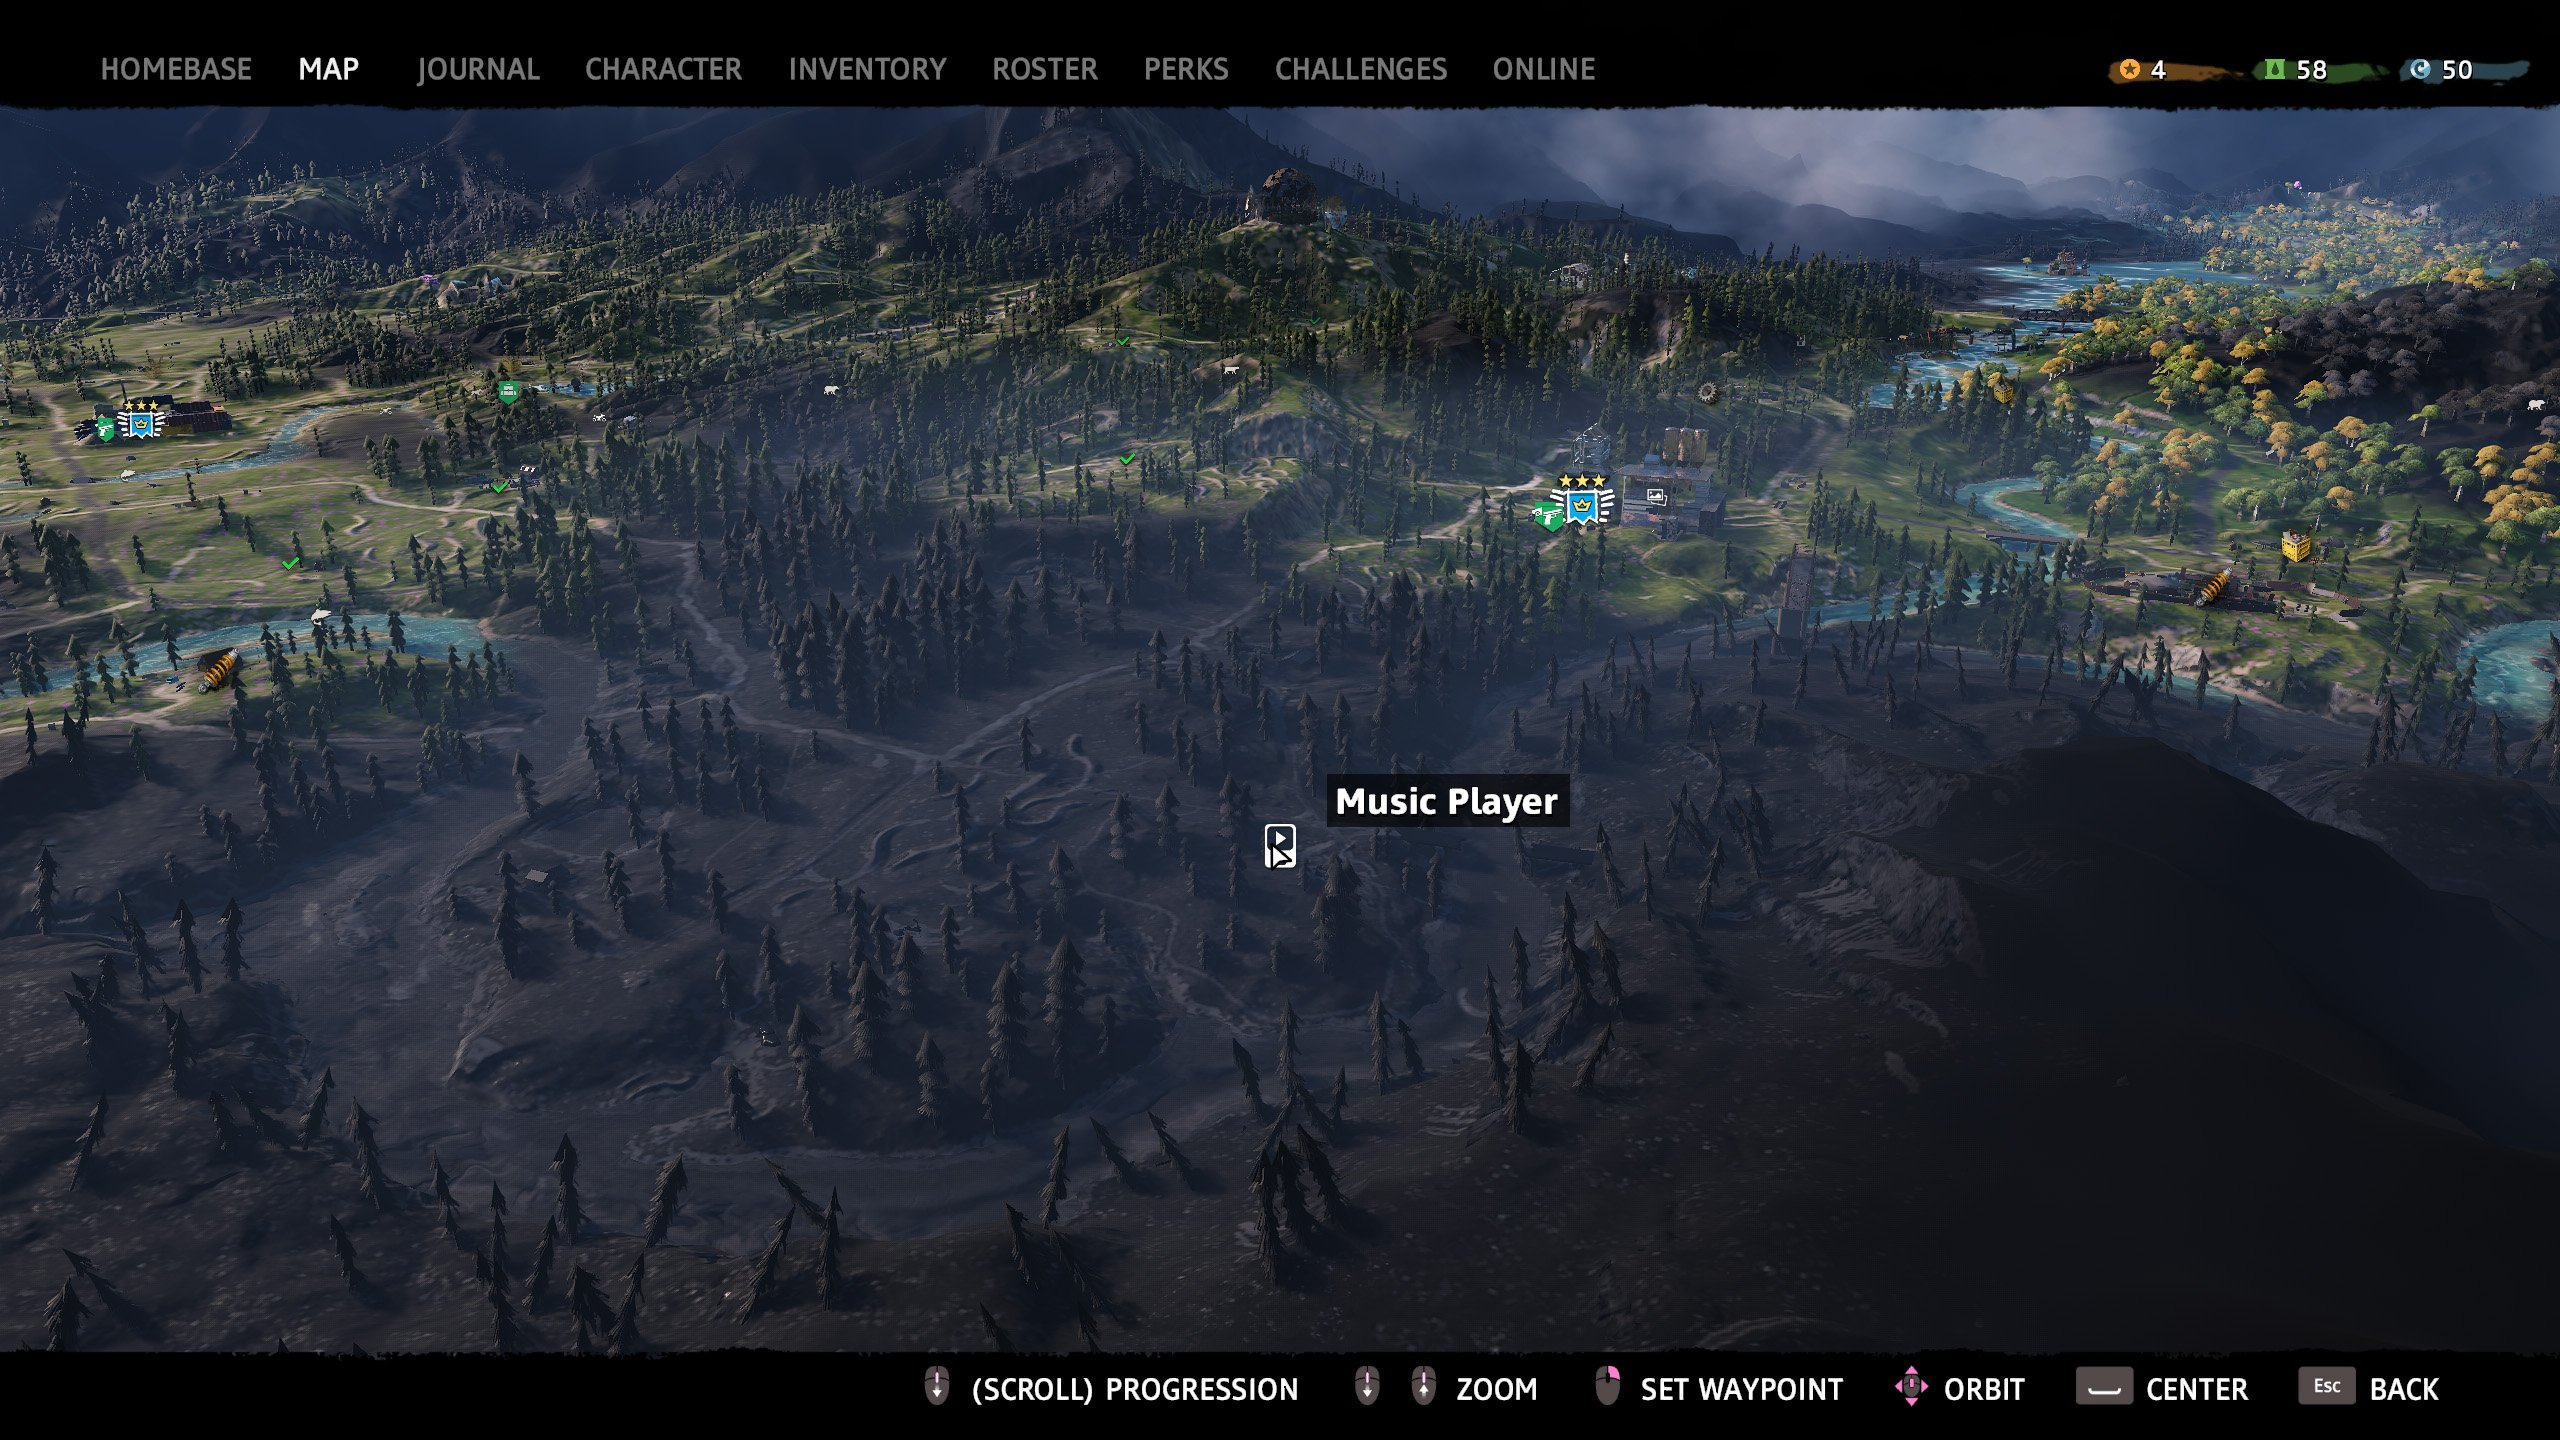 far cry new dawn music player 4 map